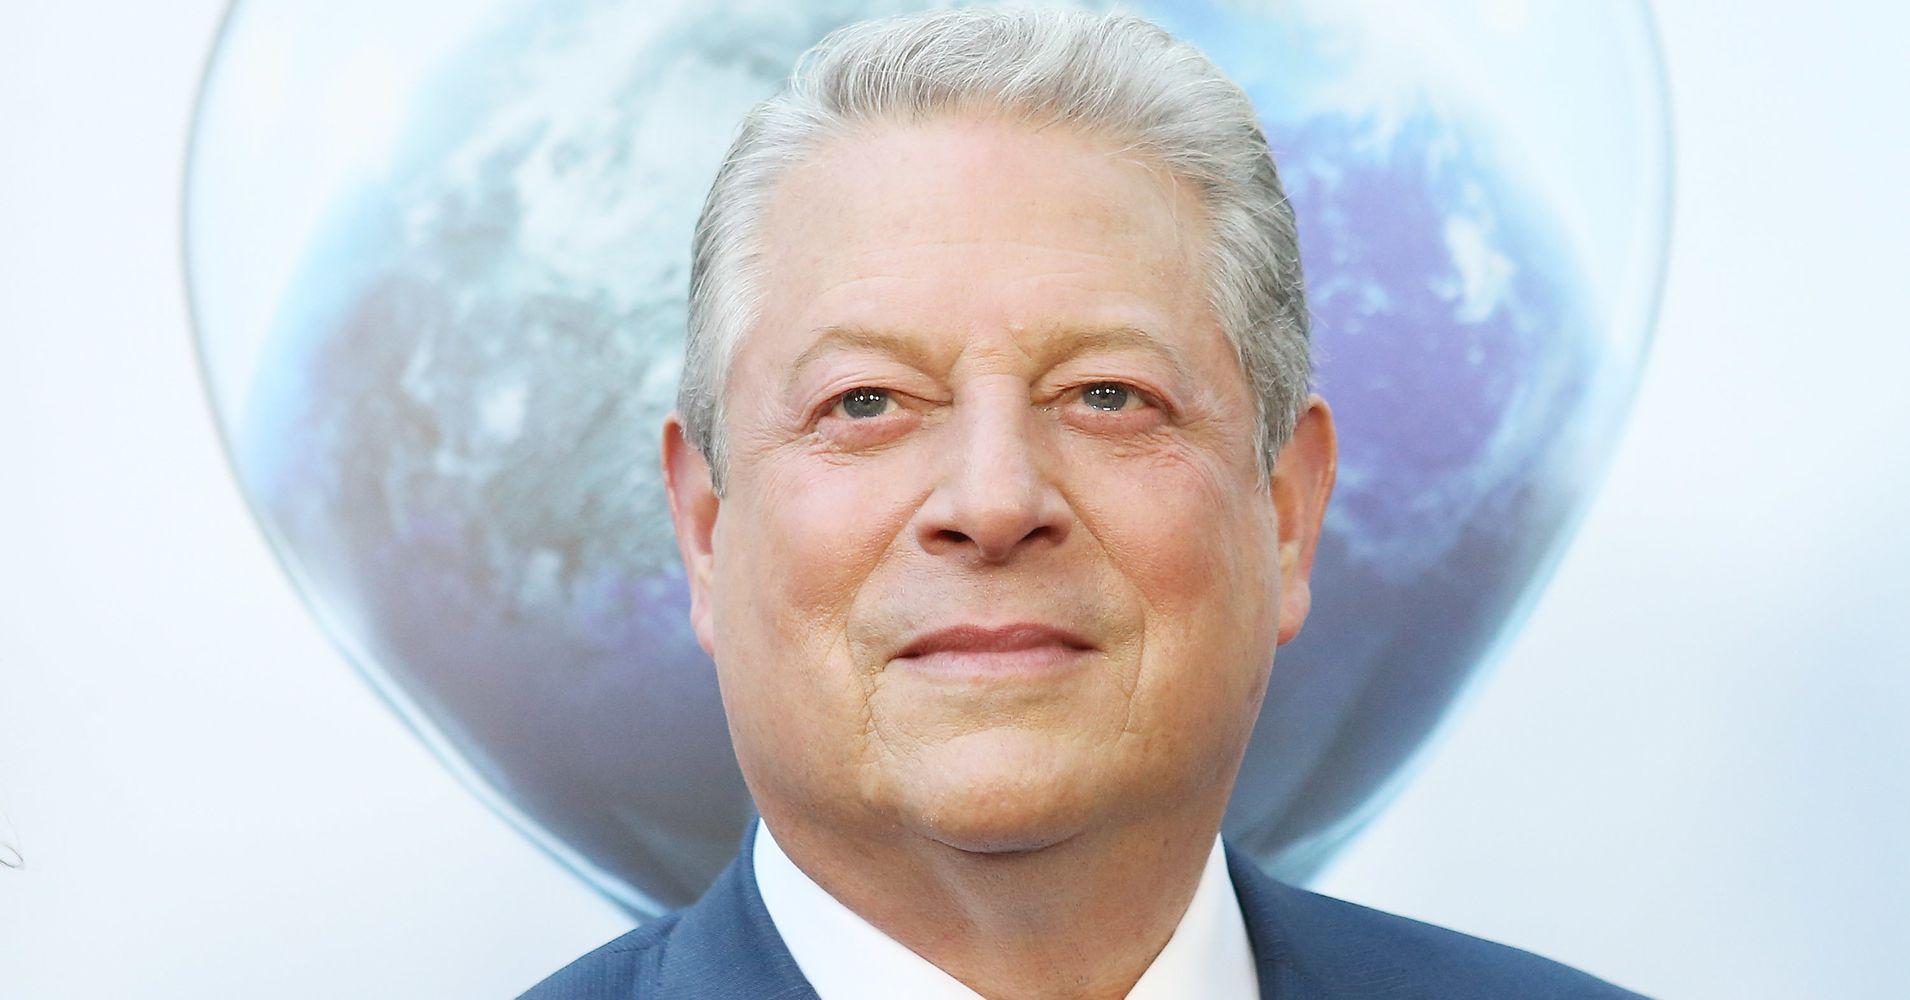 Al Gore's Stupendous Wealth Complicates His Climate Message. That Can Change.